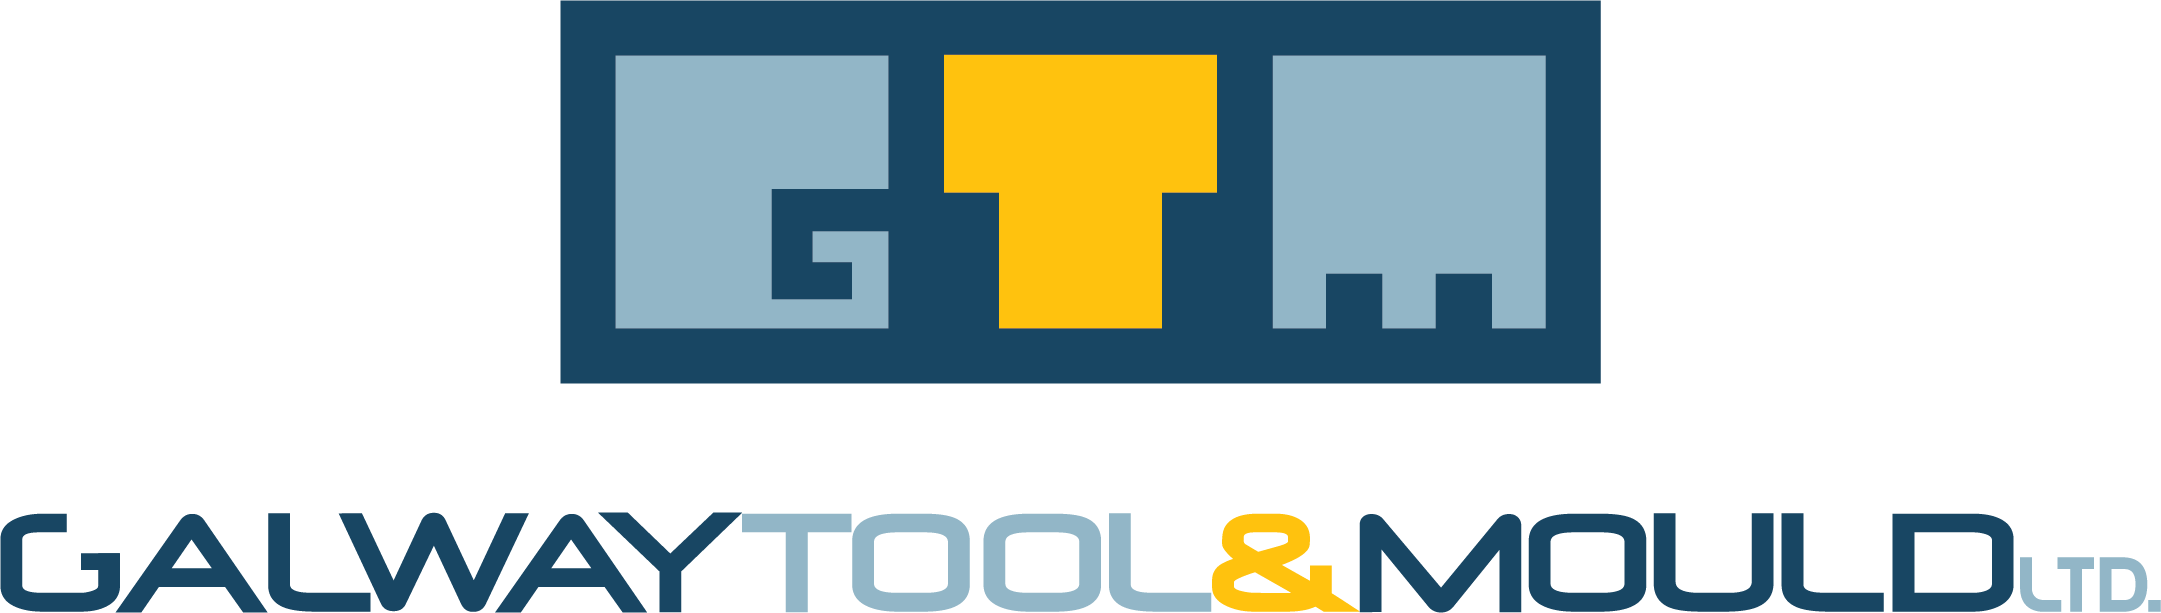 GTM-Logo-01